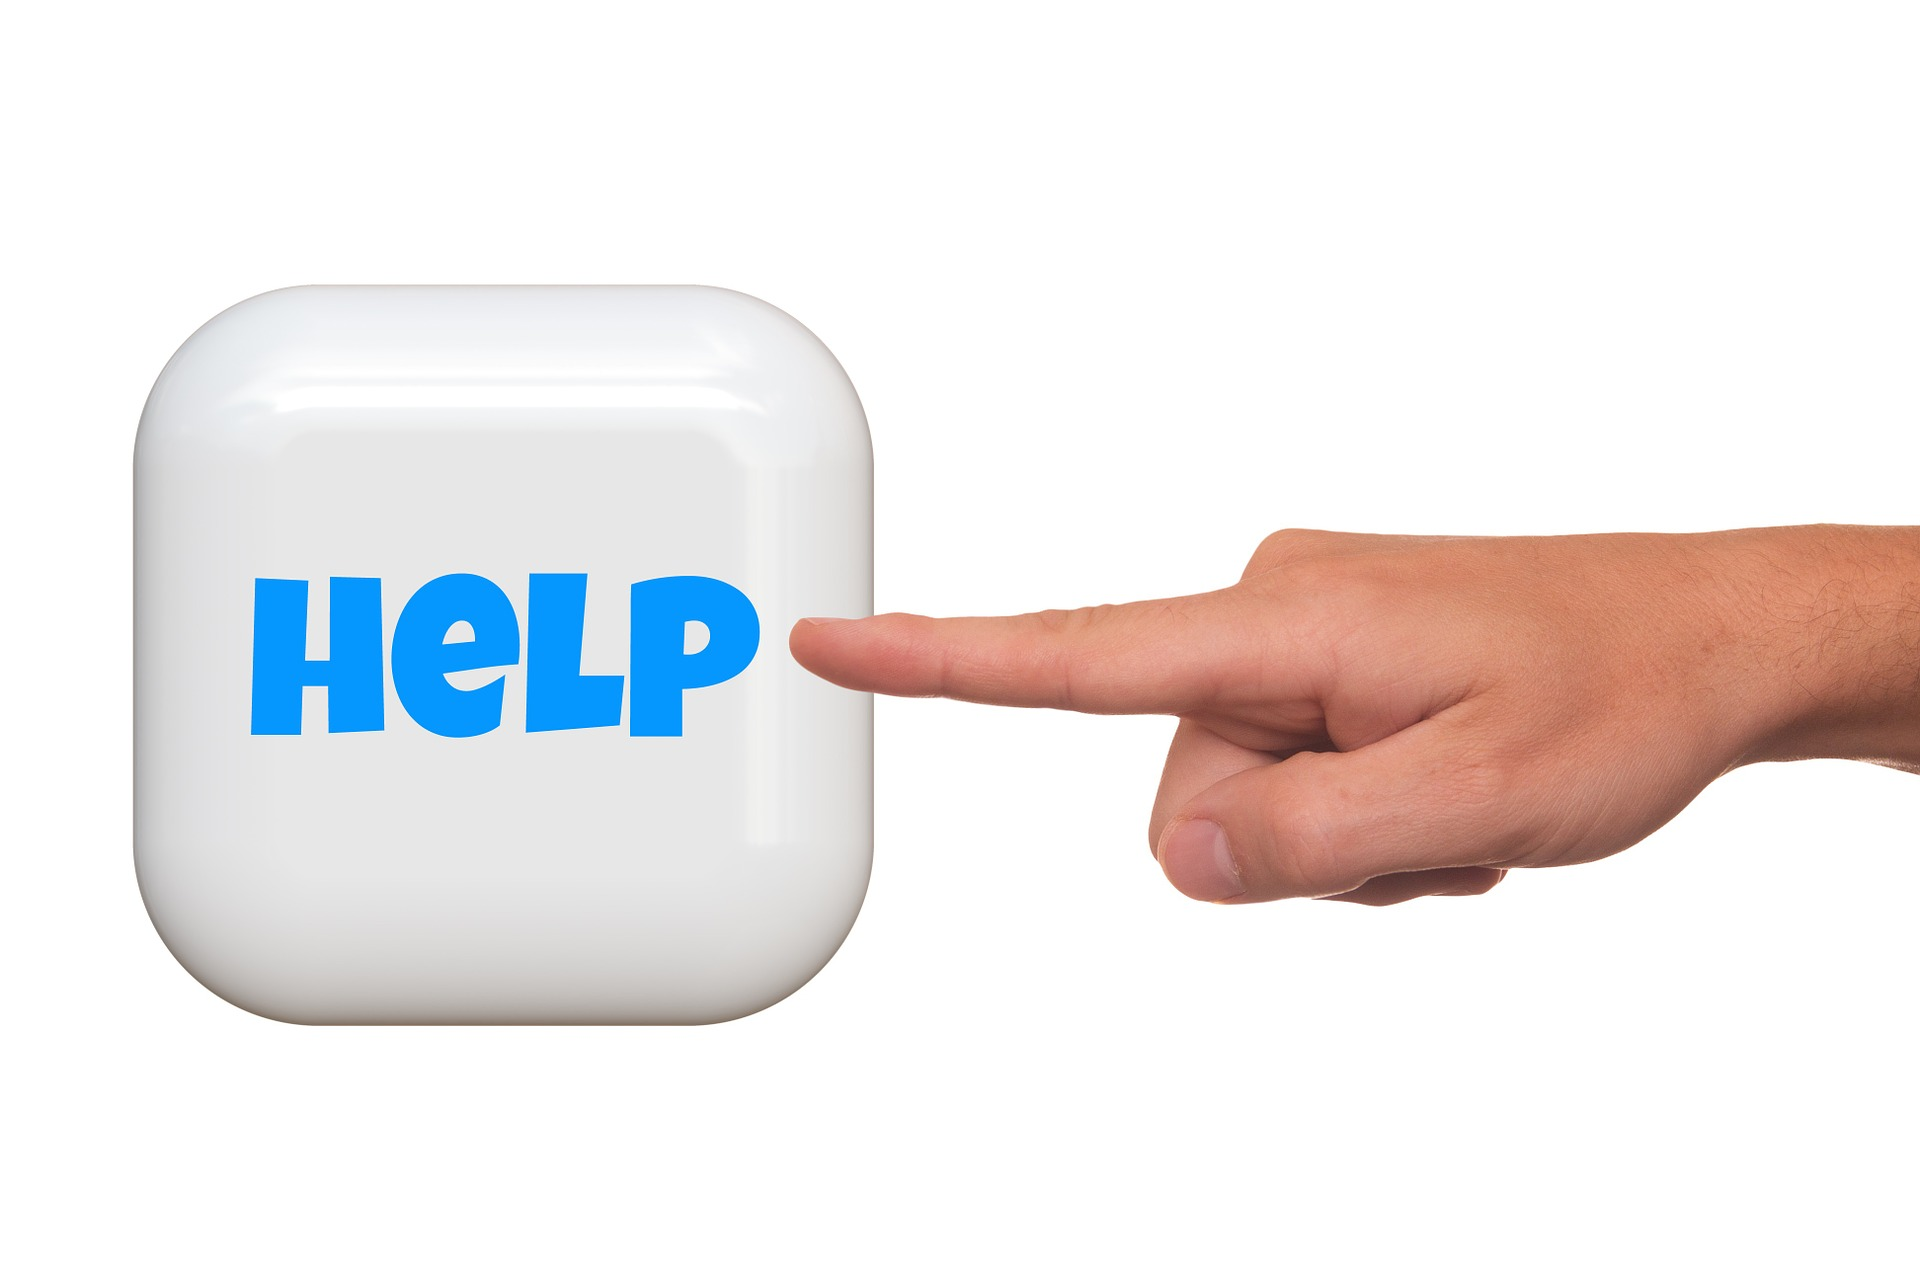 help-1276257_1920